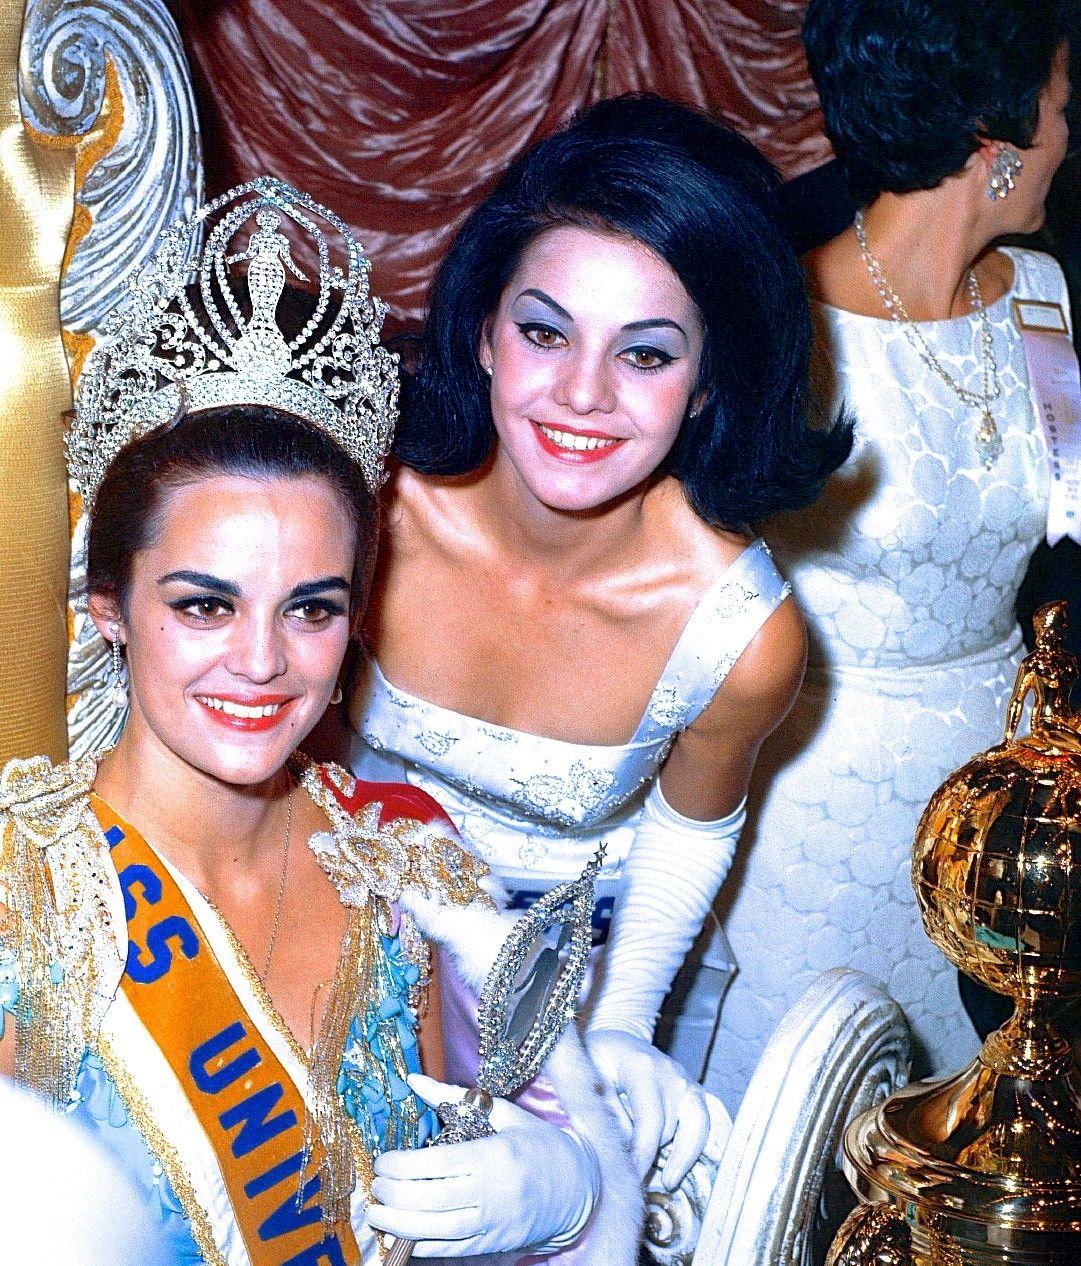 ✾◕‿◕✾ Galeria de Ieda Maria Vargas, Miss Universe 1963.✾◕‿◕✾ - Página 4 S-l16013